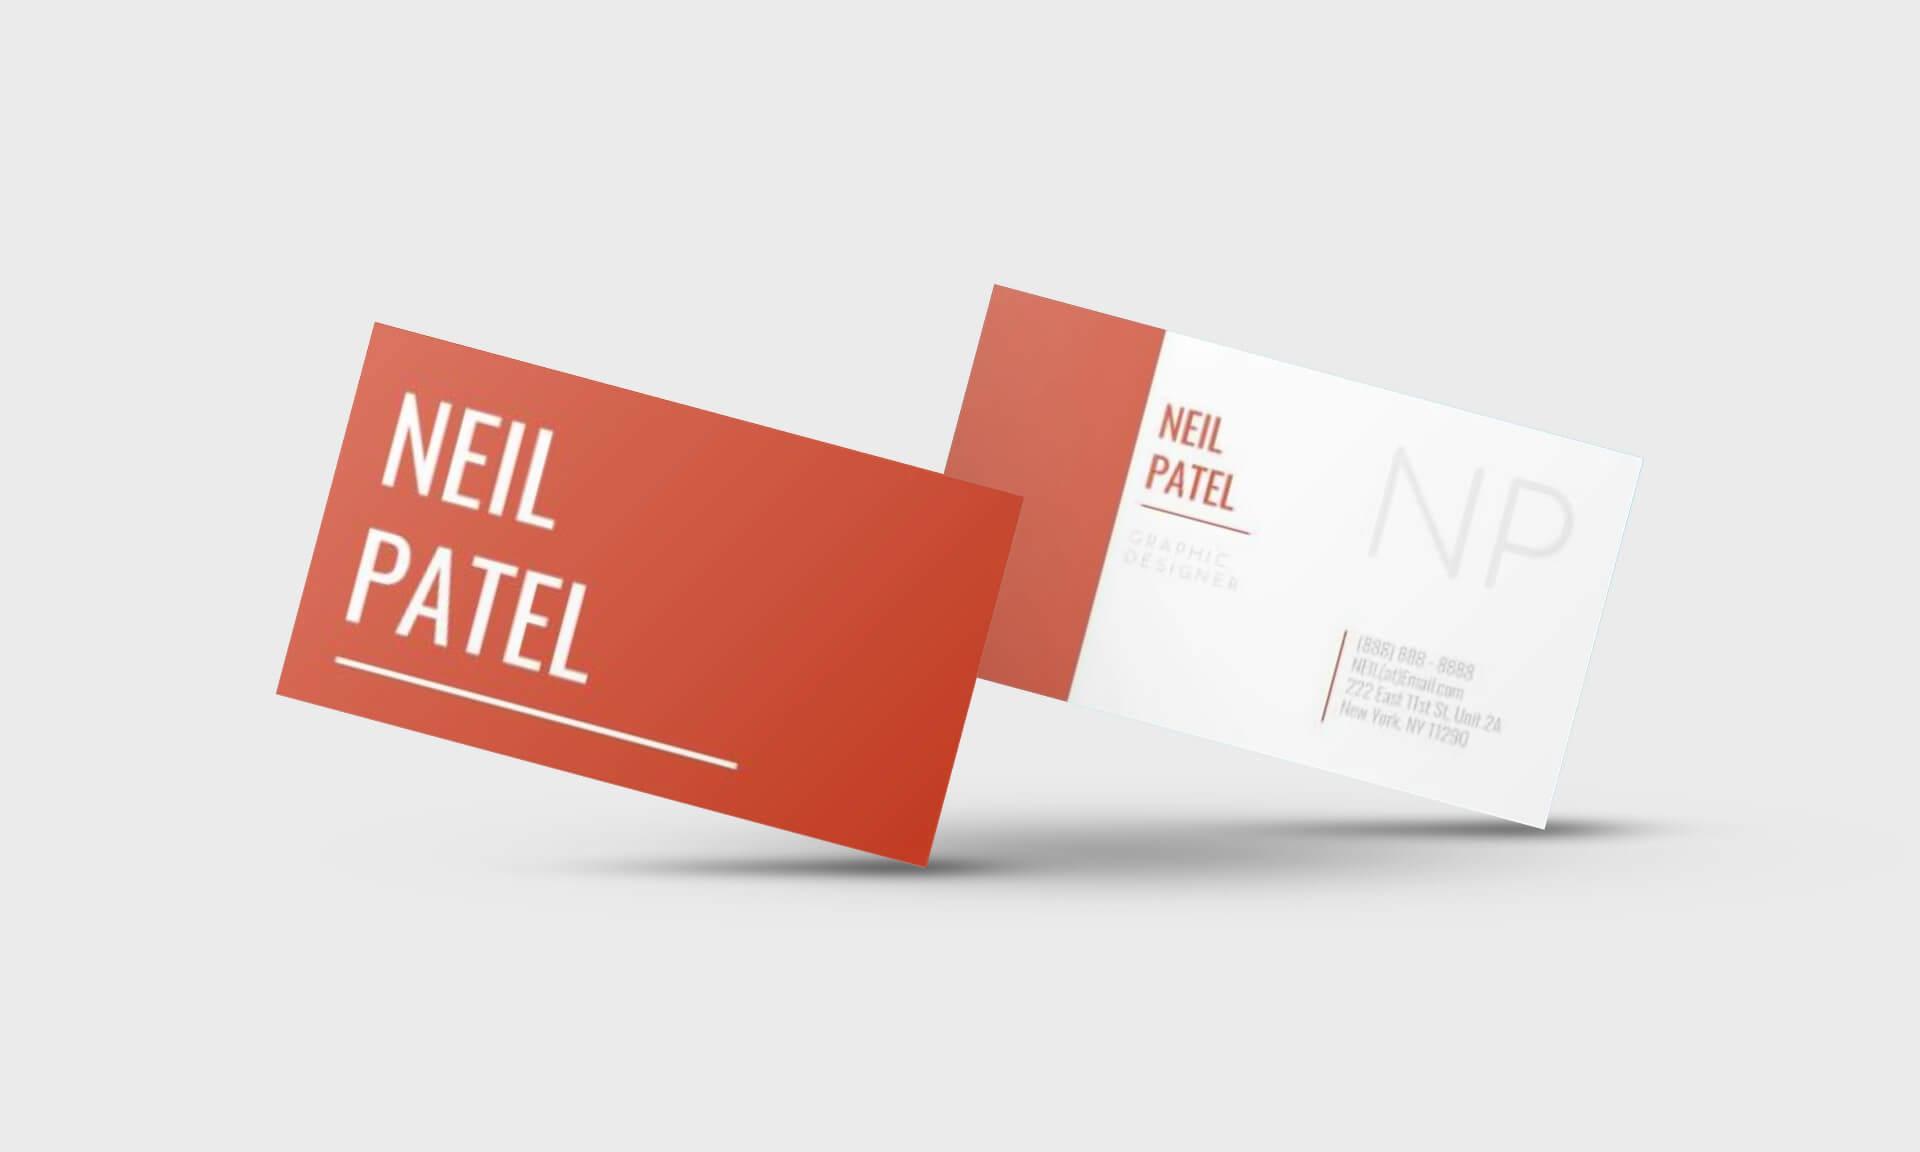 Neil Patel Google Docs Business Card Template - Stand Out Shop In Google Docs Business Card Template